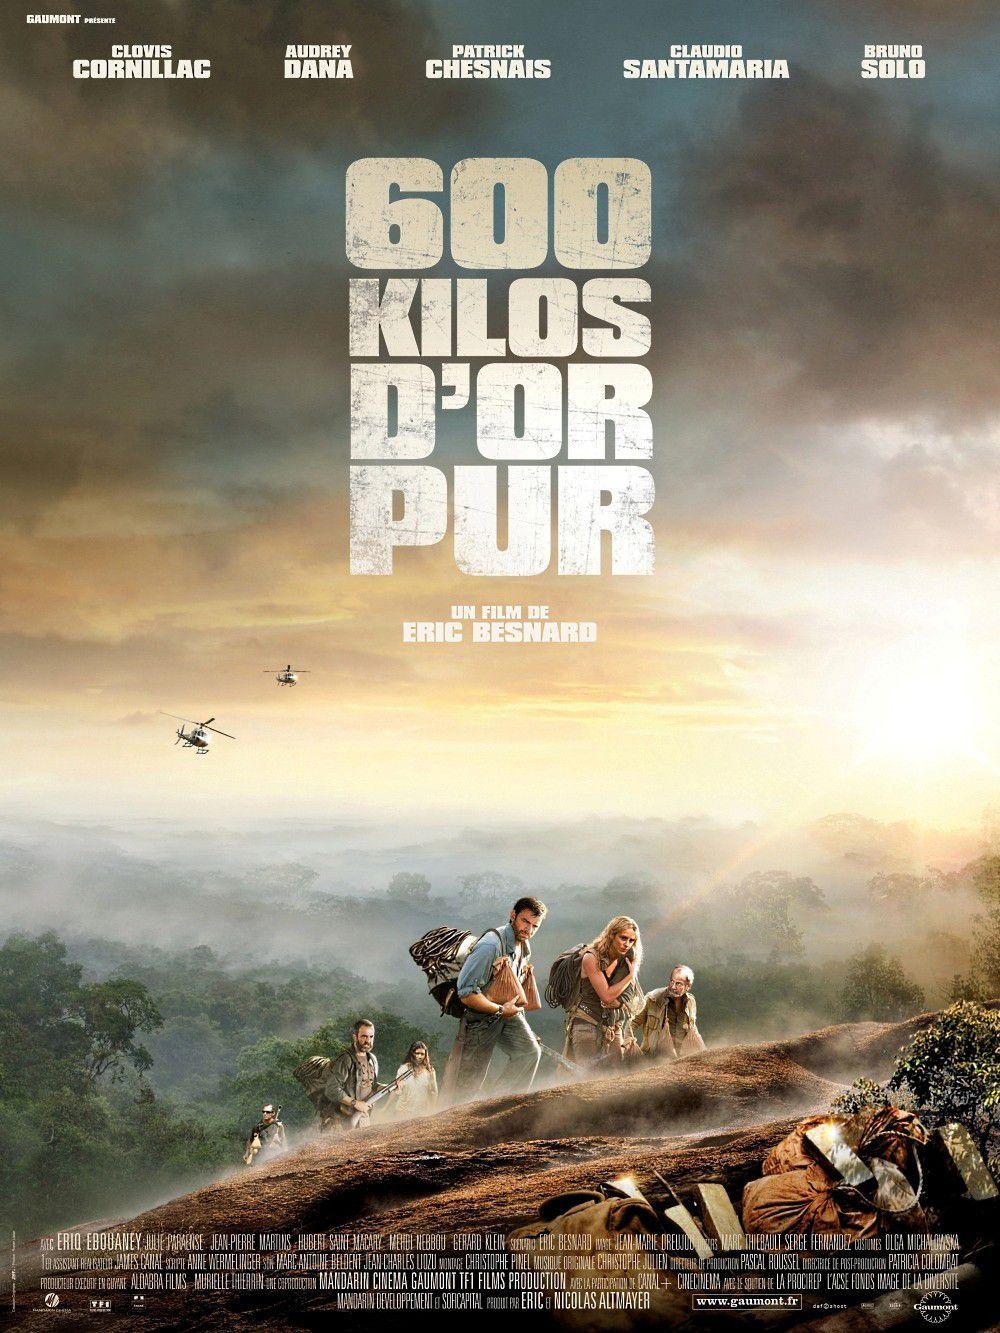 600 Kilos d'or pur - Film (2010)